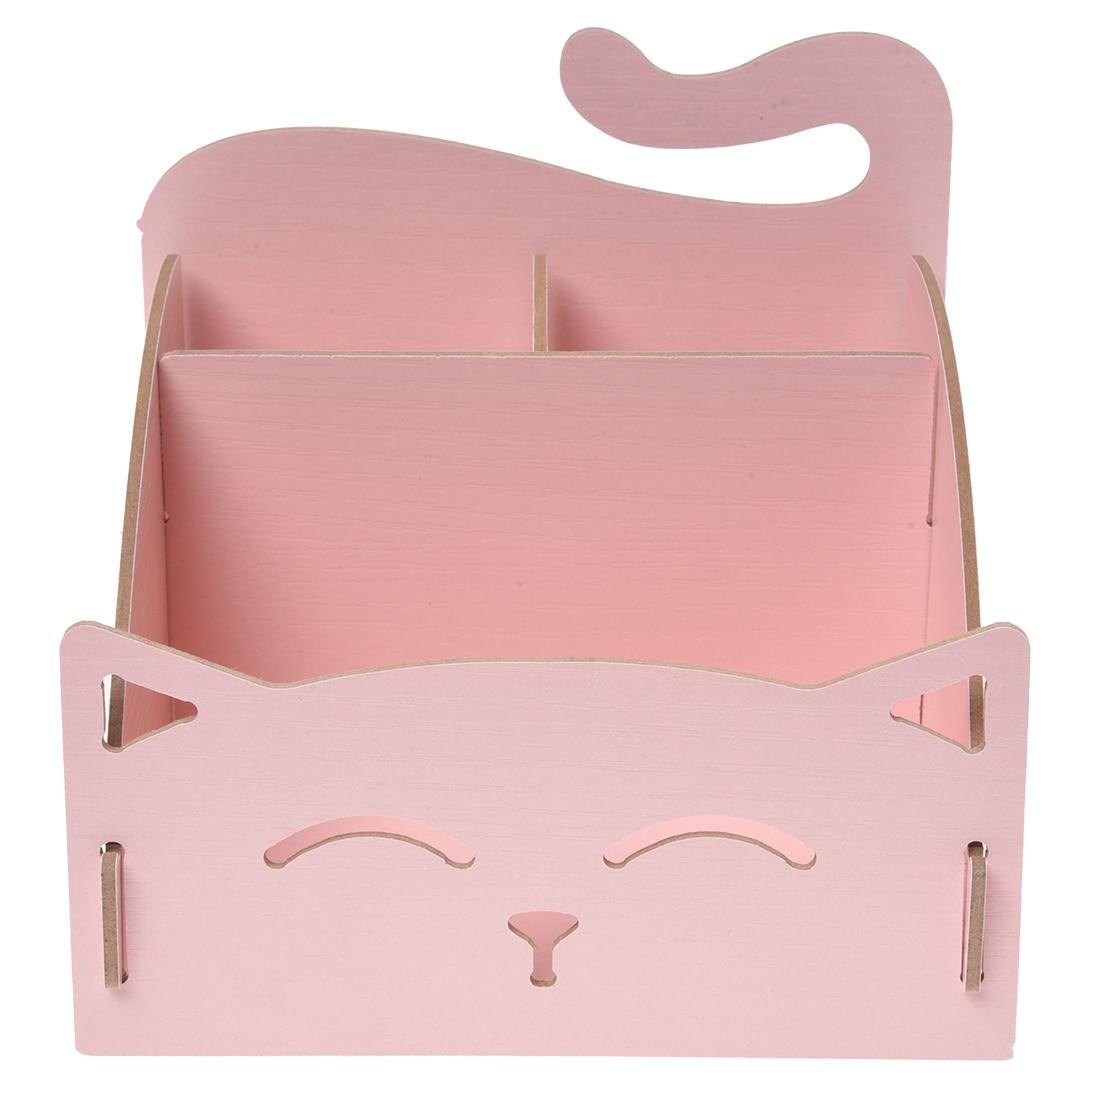 Best Wooden Box Cute Cat Pen Box Desktop Storage Assembly DIY Wood Makeup Organizer Cosmetics Storage Box 15.4*13*13.5cm (pink)